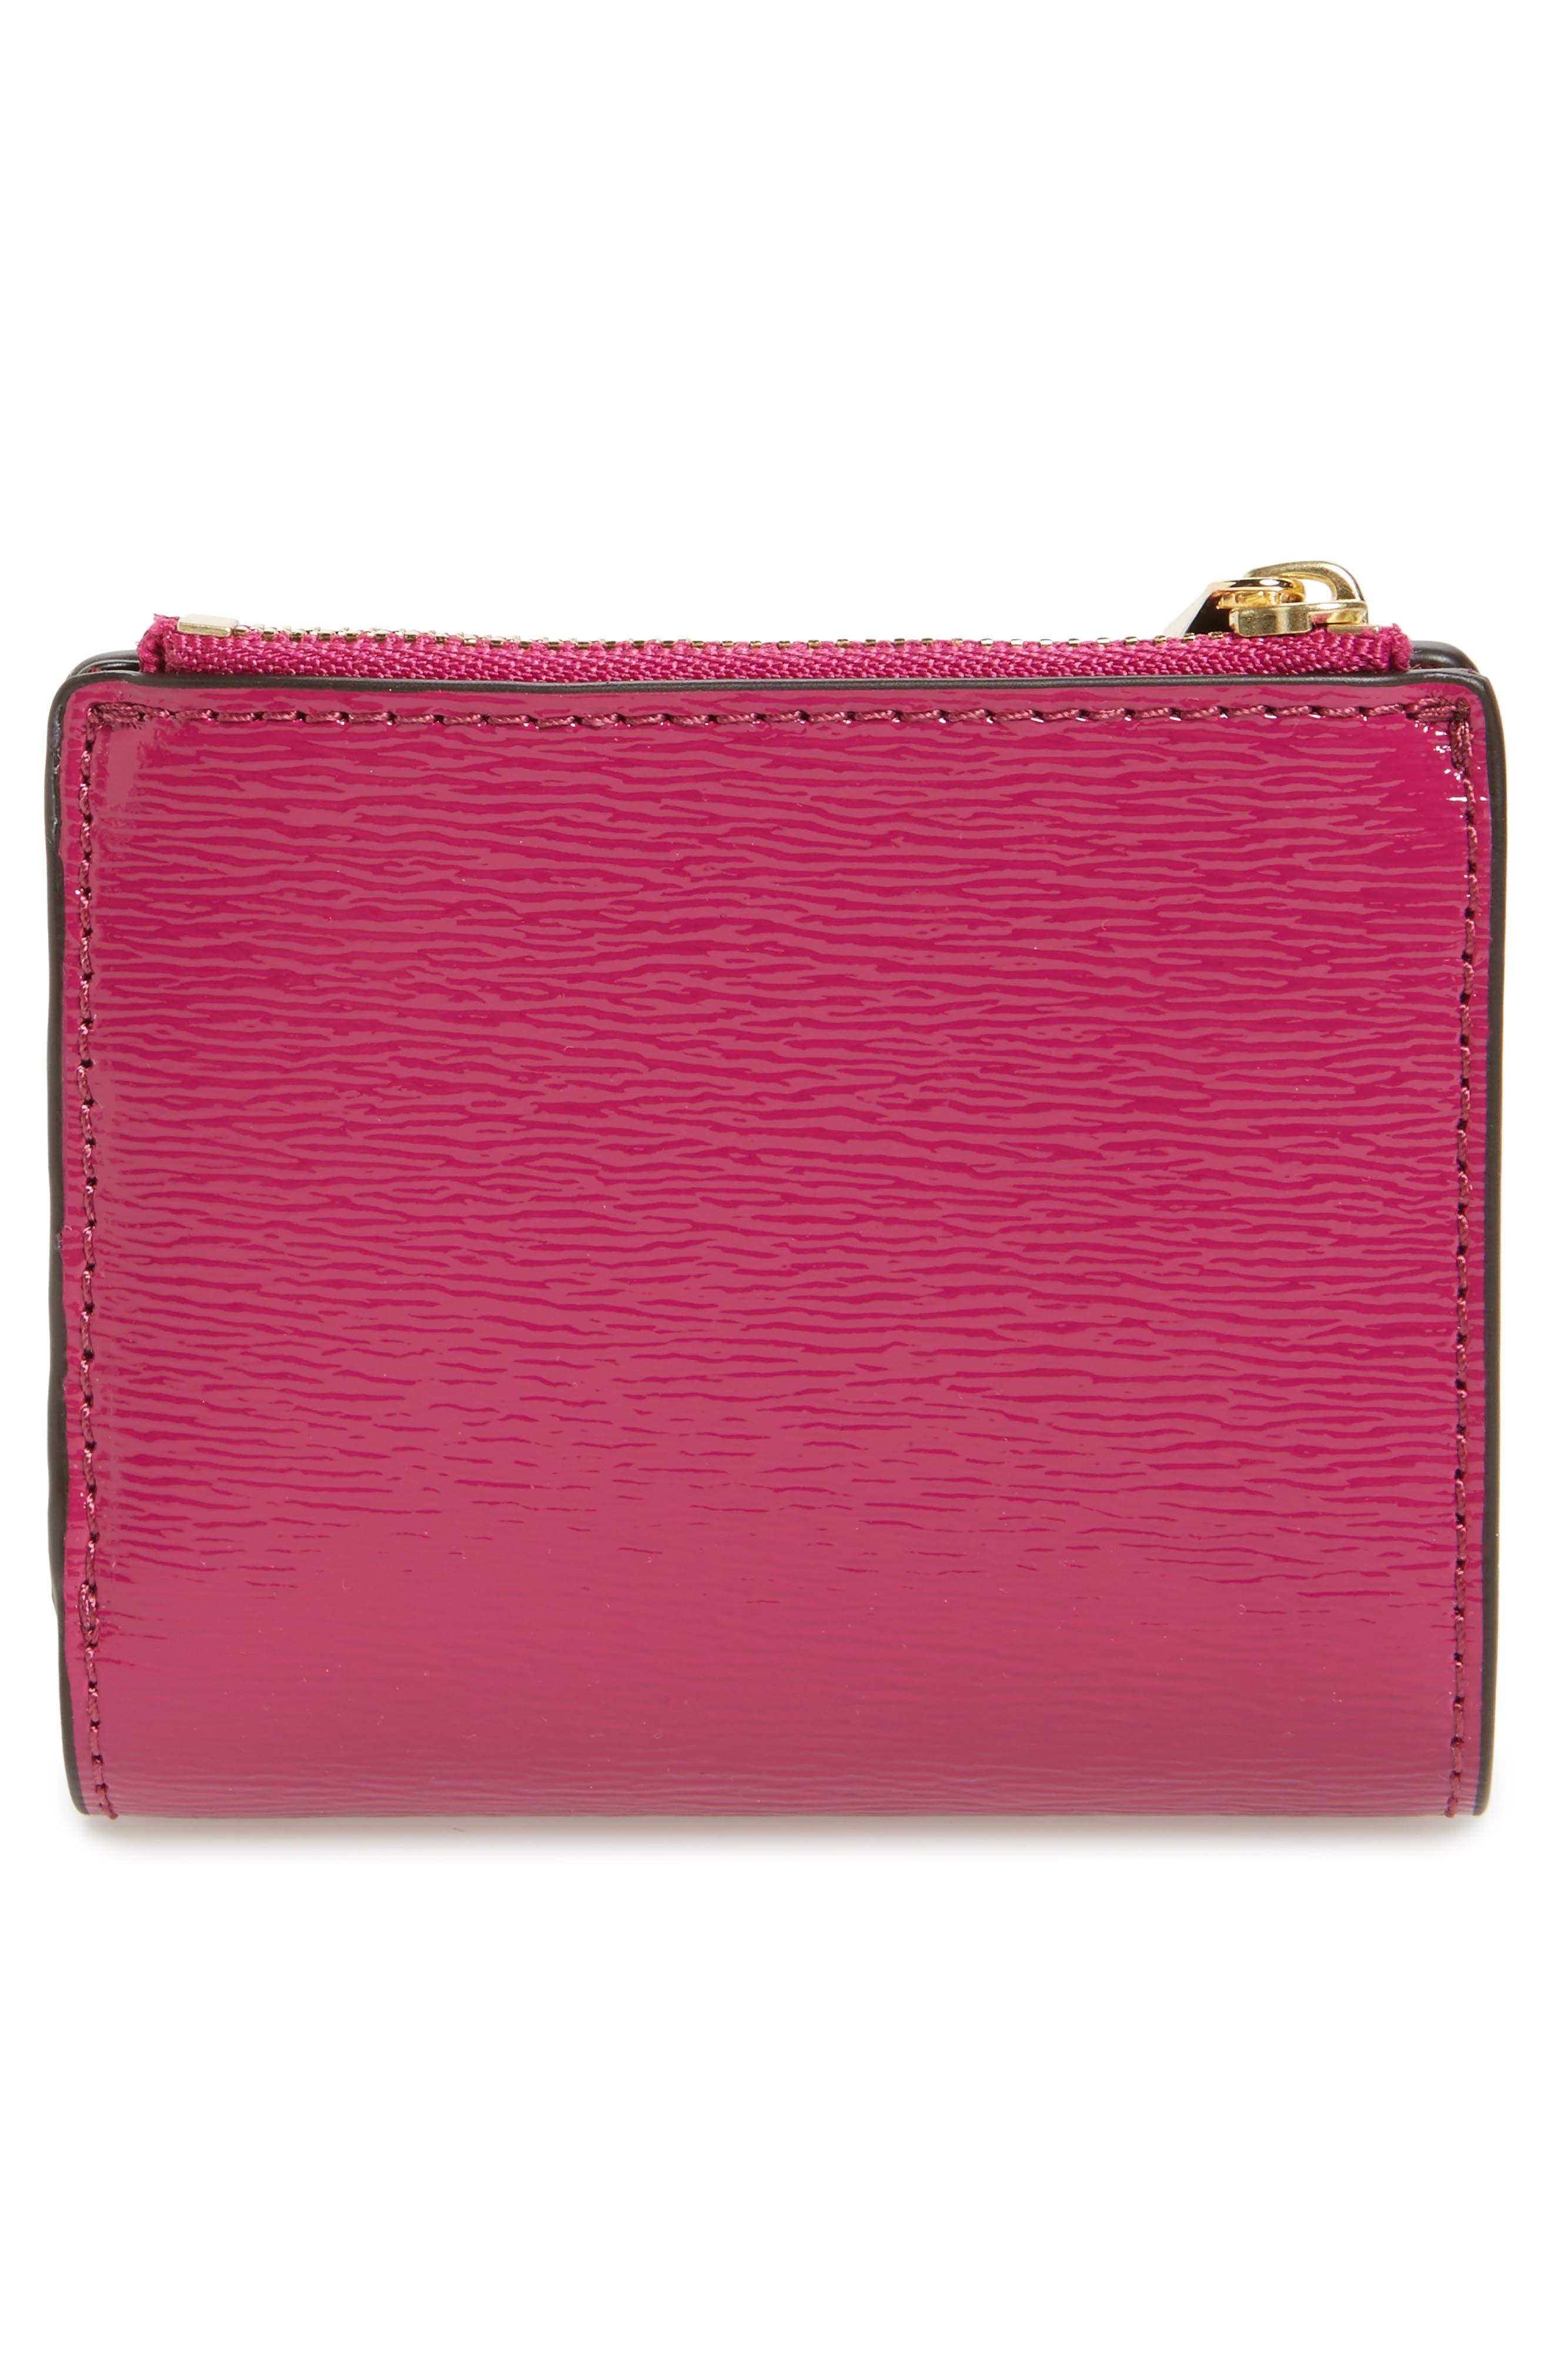 Mini Robinson Wallet Patent Leather Bifold Wallet,                             Alternate thumbnail 11, color,